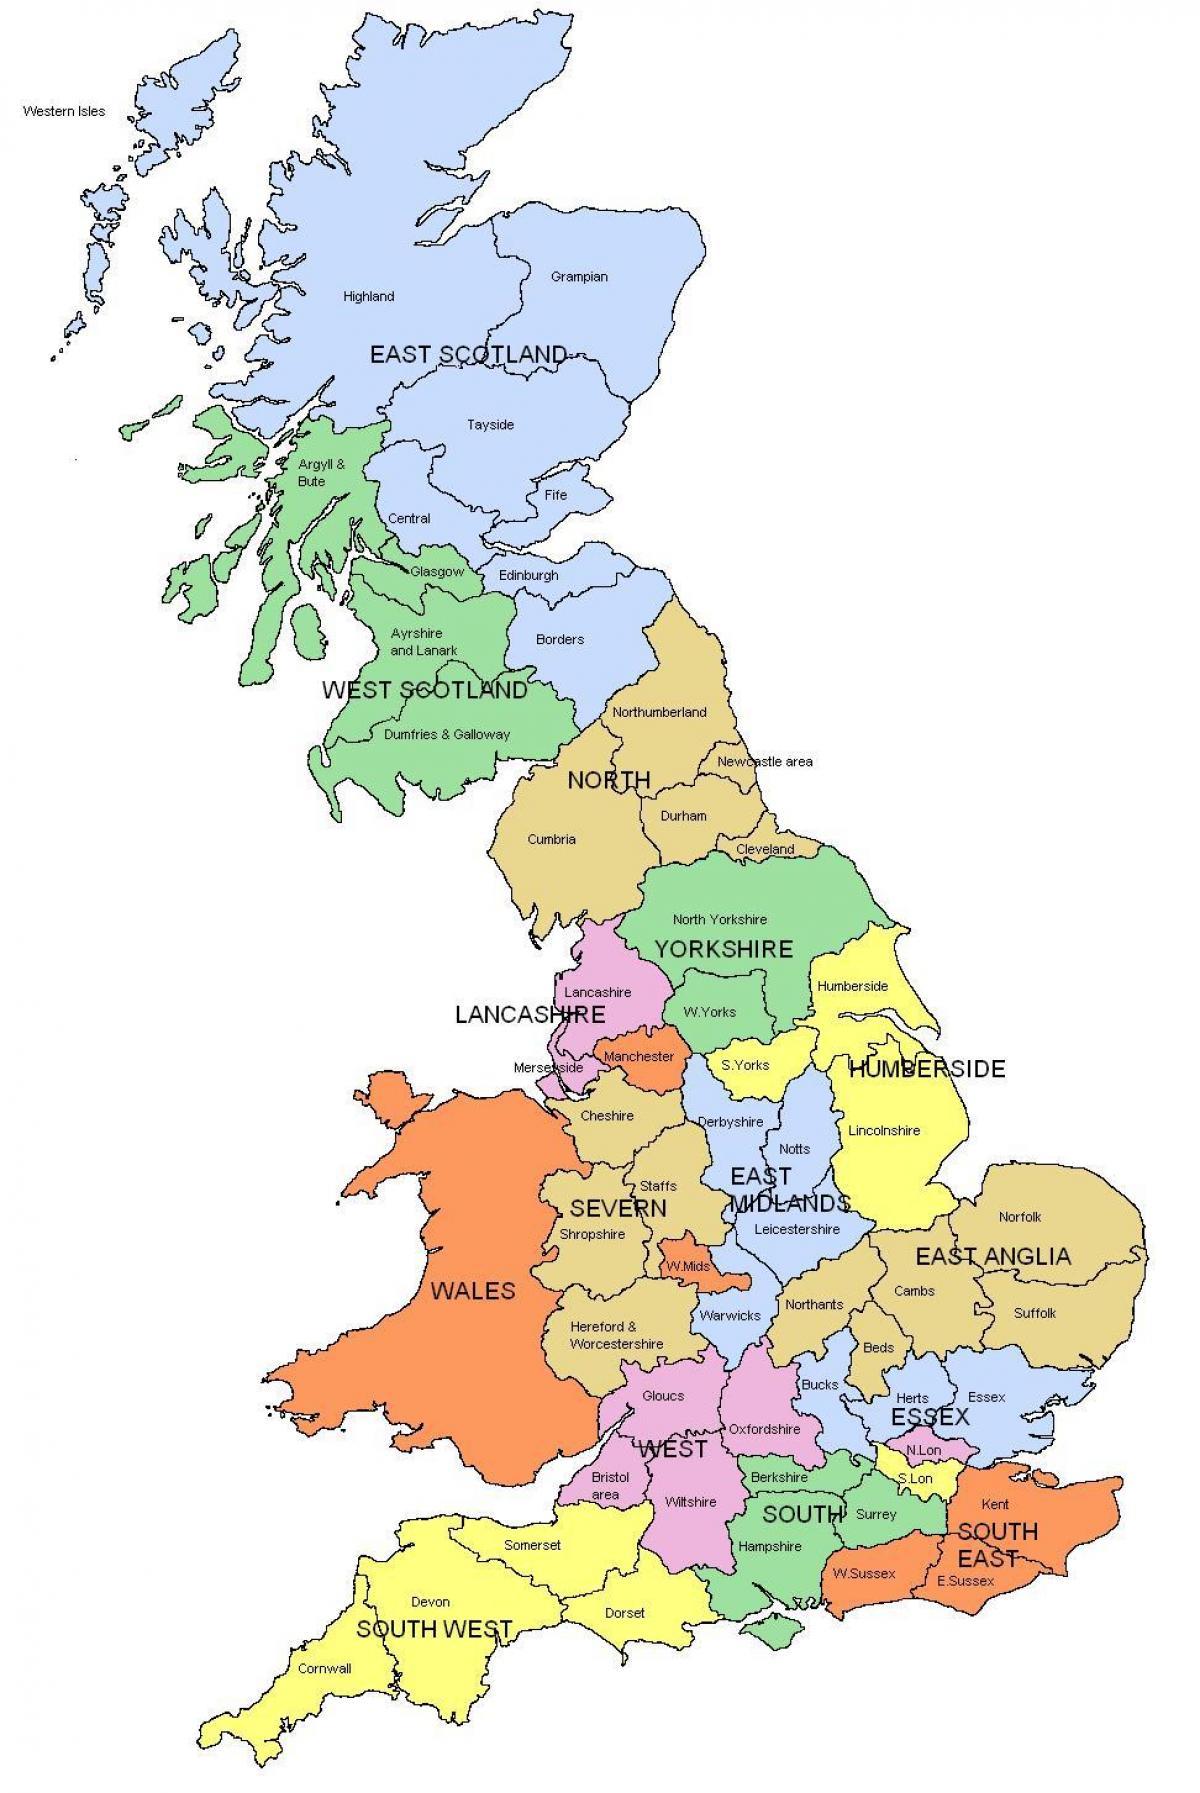 Kort Uk Amter Regioner Uk Kort Regioner Og Amter I Det Nordlige